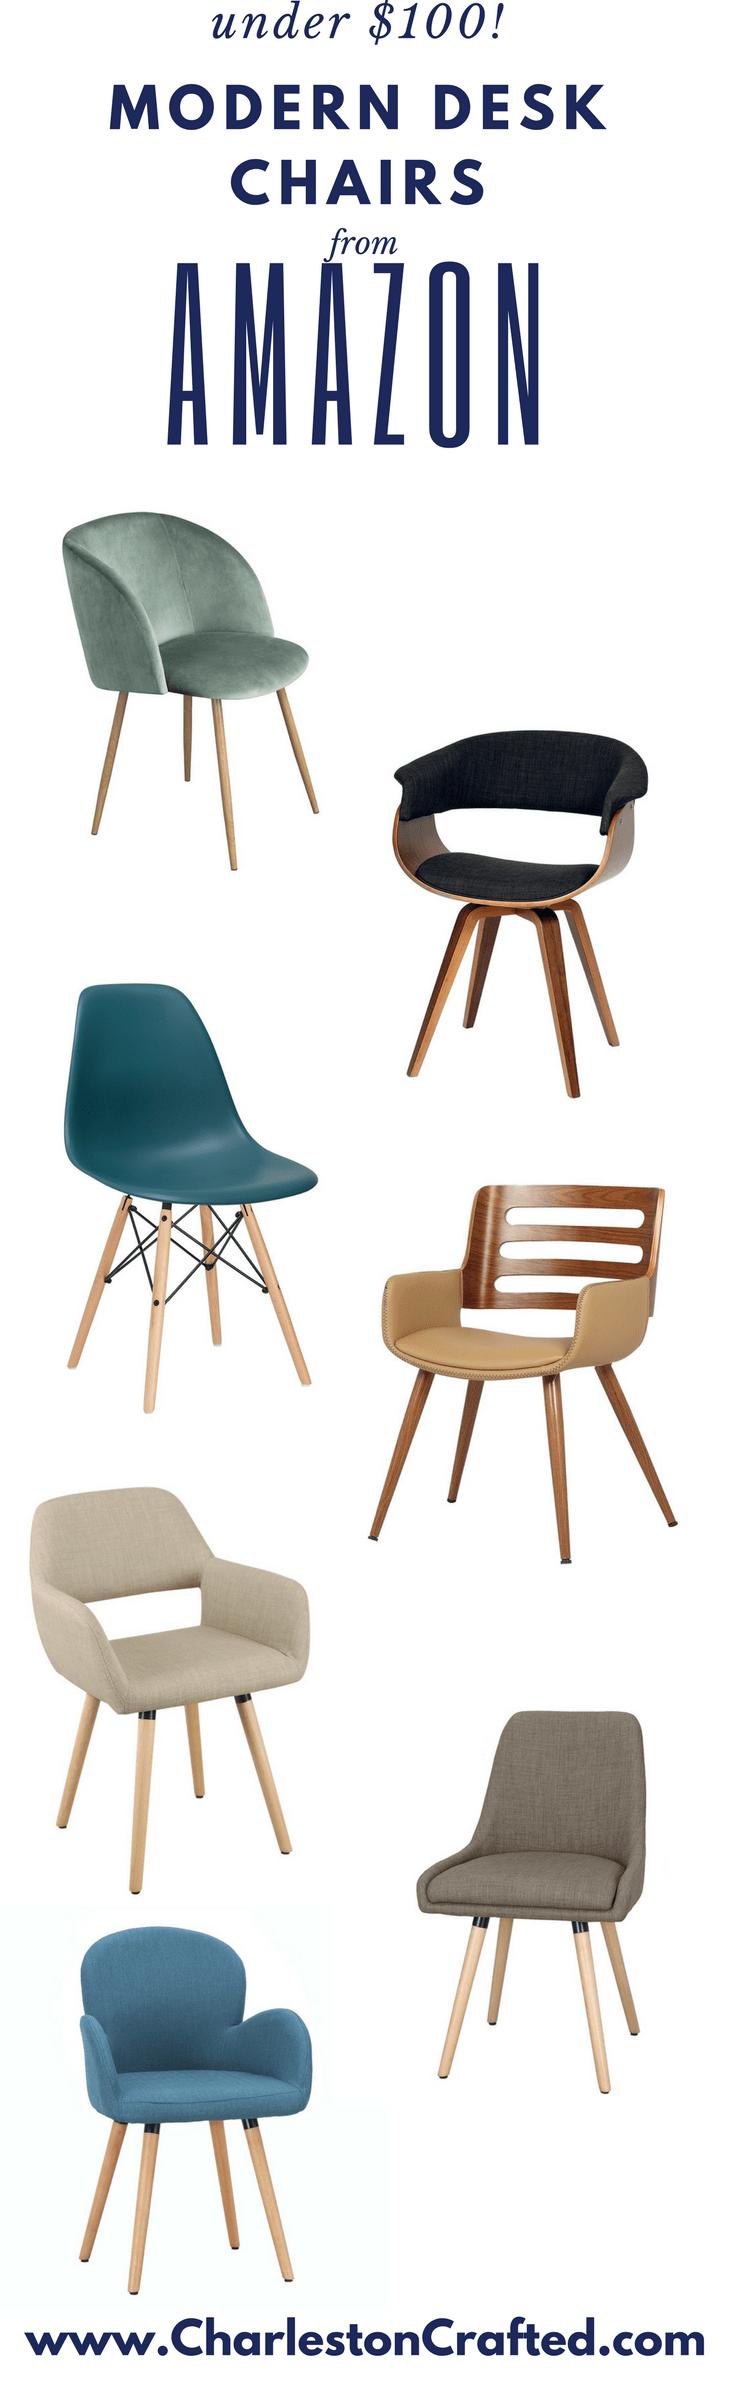 Modern Desk Chairs Under $100 on Amazon Prime - Charleston Crafted